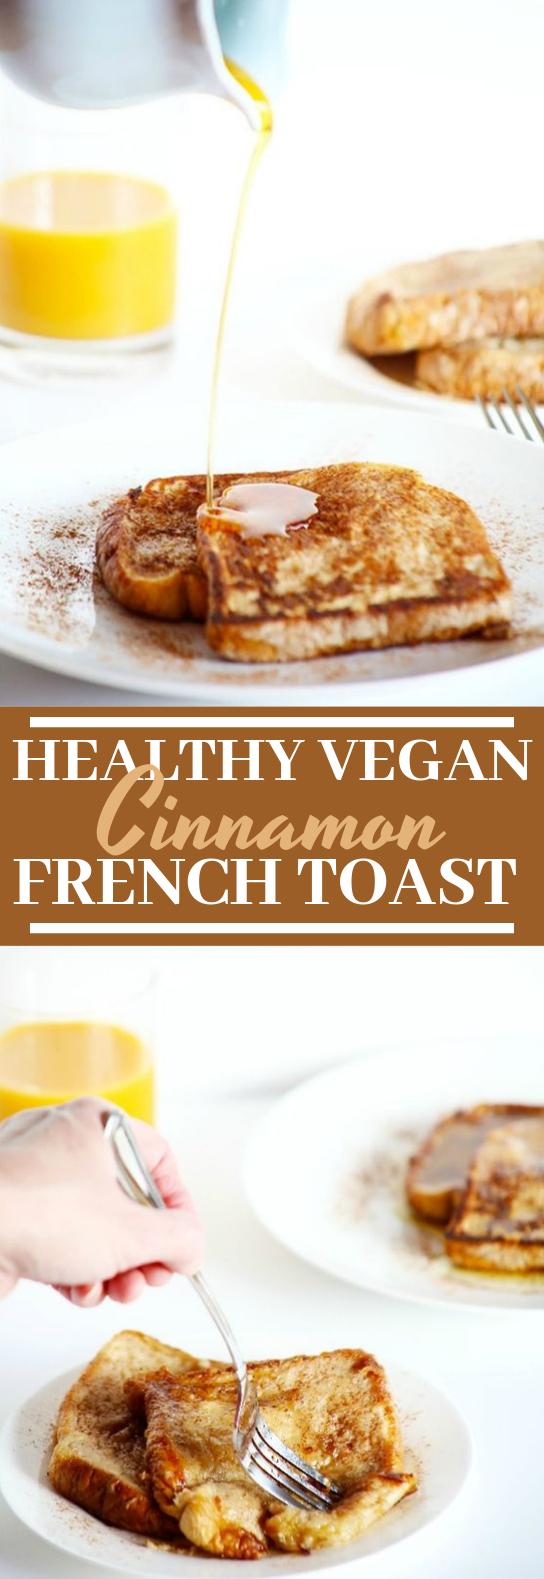 Healthy Vegan Cinnamon French Toast #vegan #breakfast